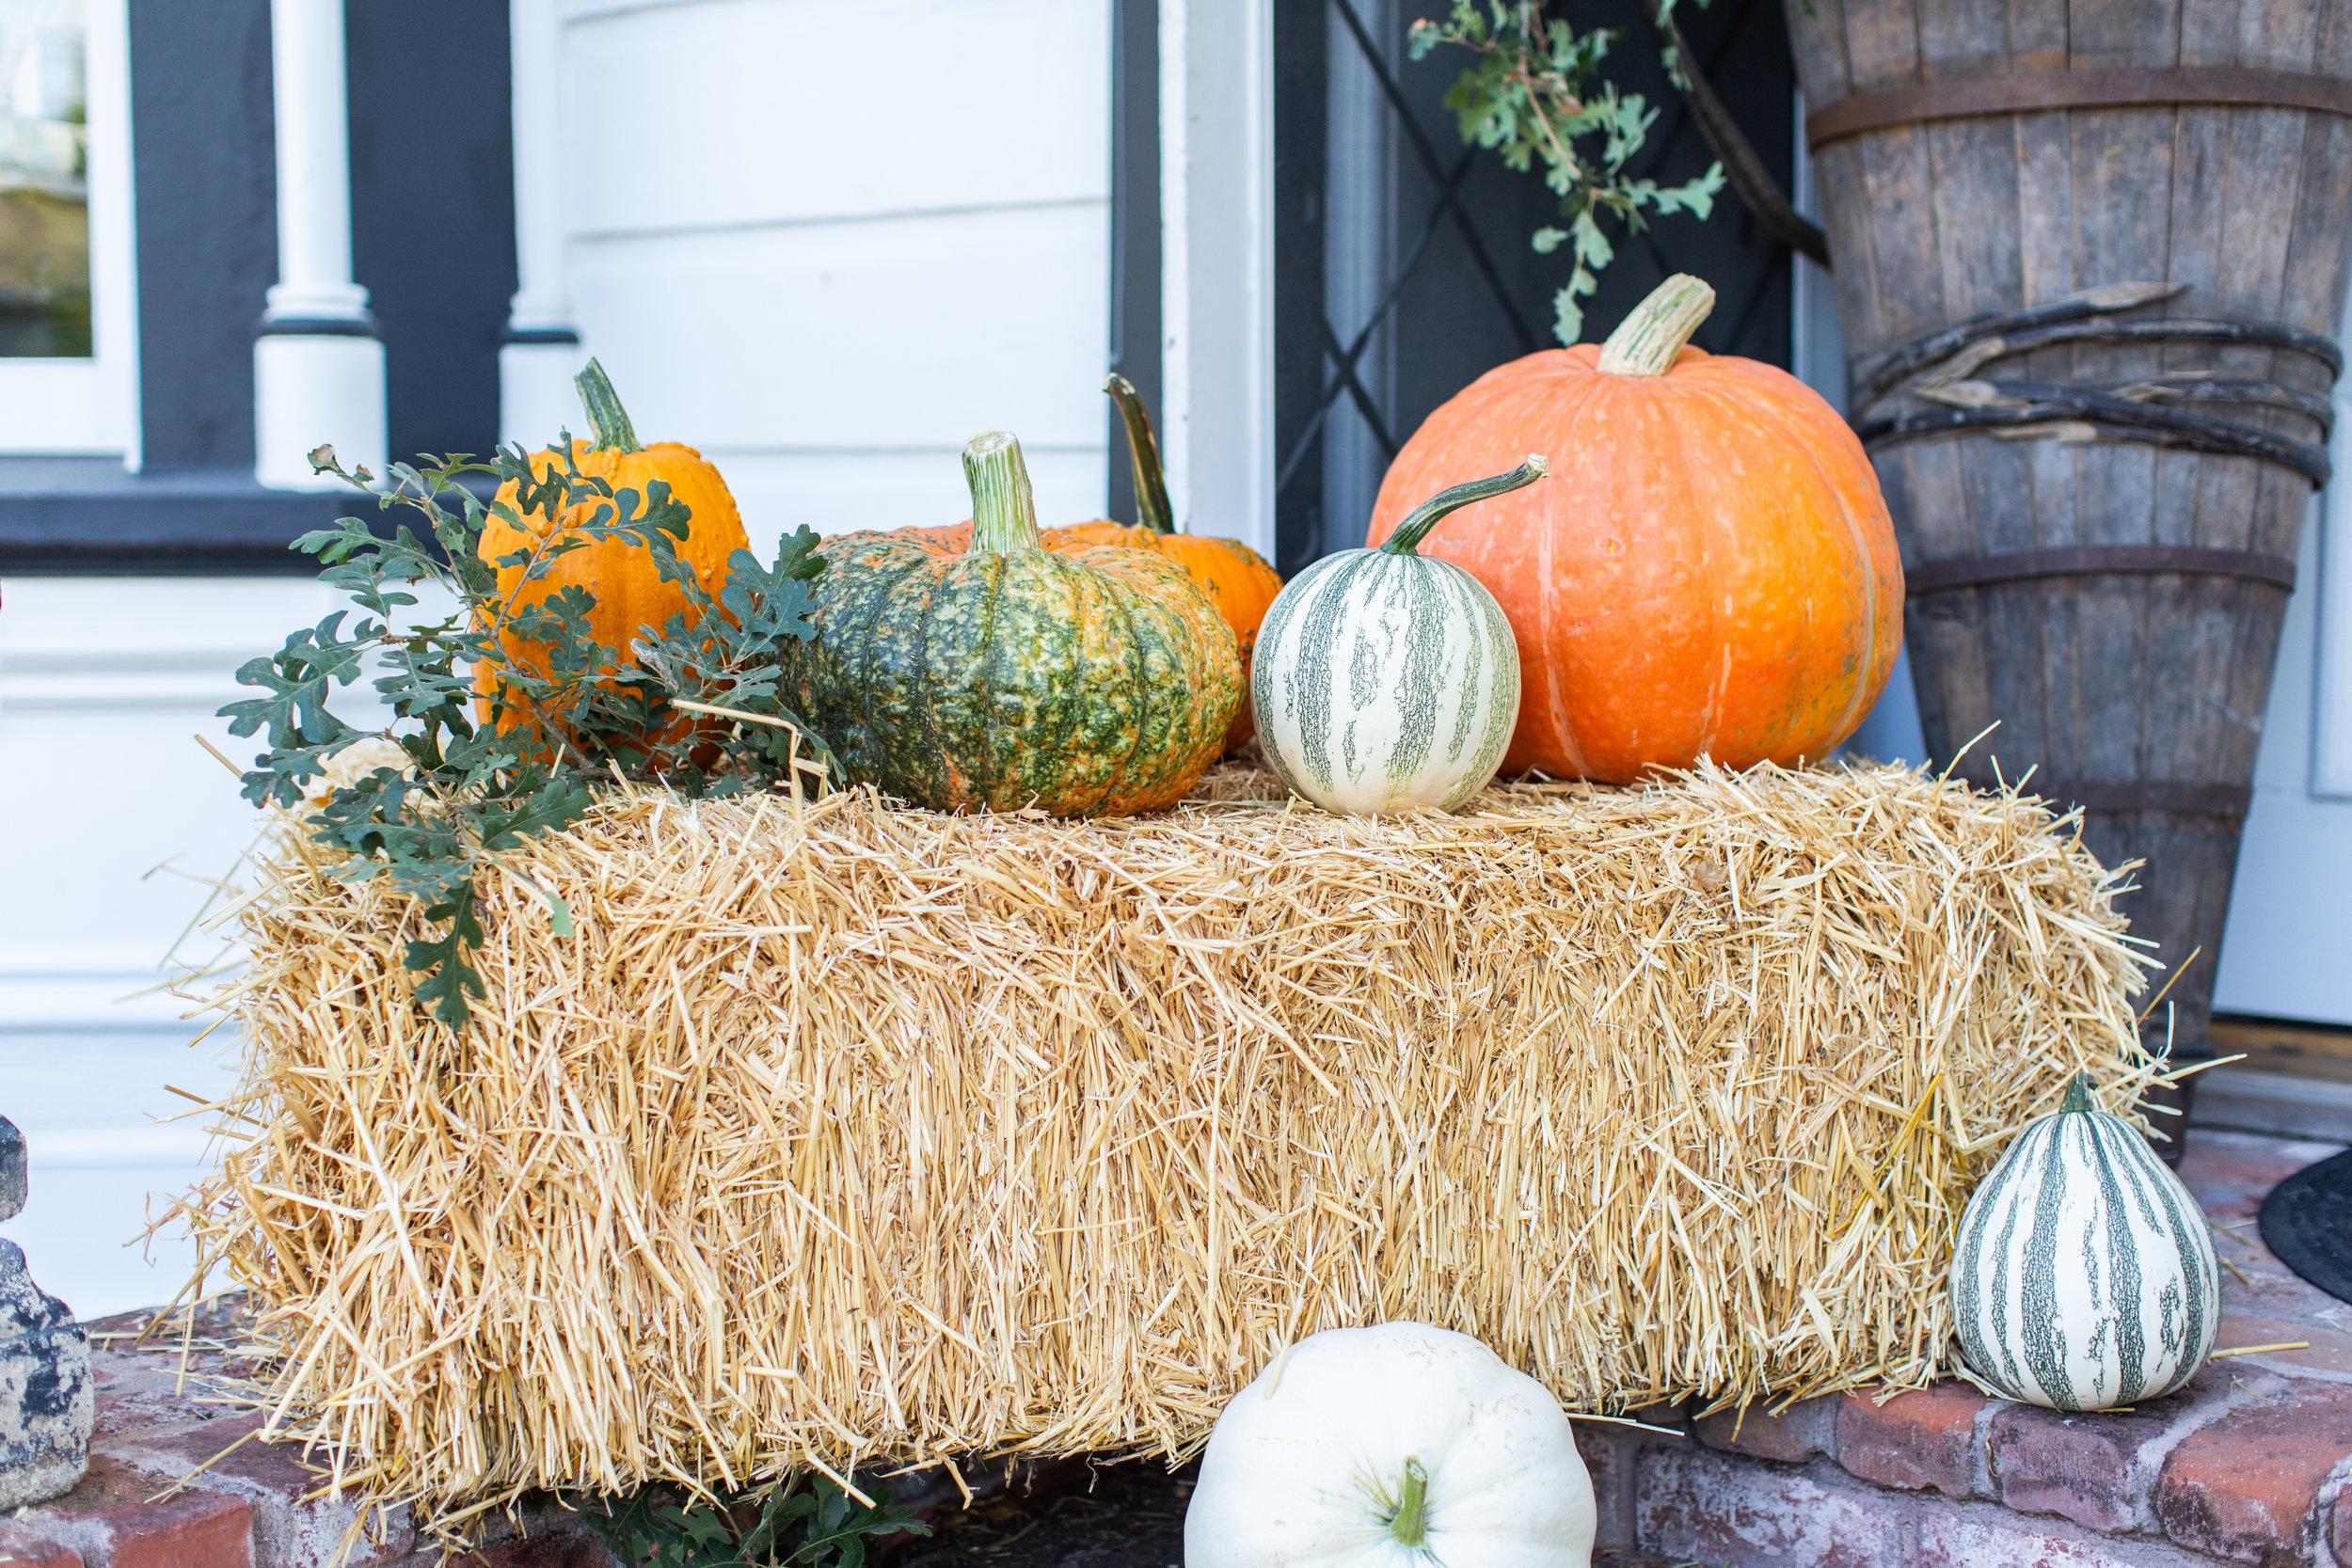 Chateau Sonoma, Sonoma, California, Antiques, Home Decor, Fall, Autumn, Farm, Chateau Sonoma Farm, Pumpkins, Fall Decor, Pumpkin Patch, Wine Country, Cornerstone Sonoma